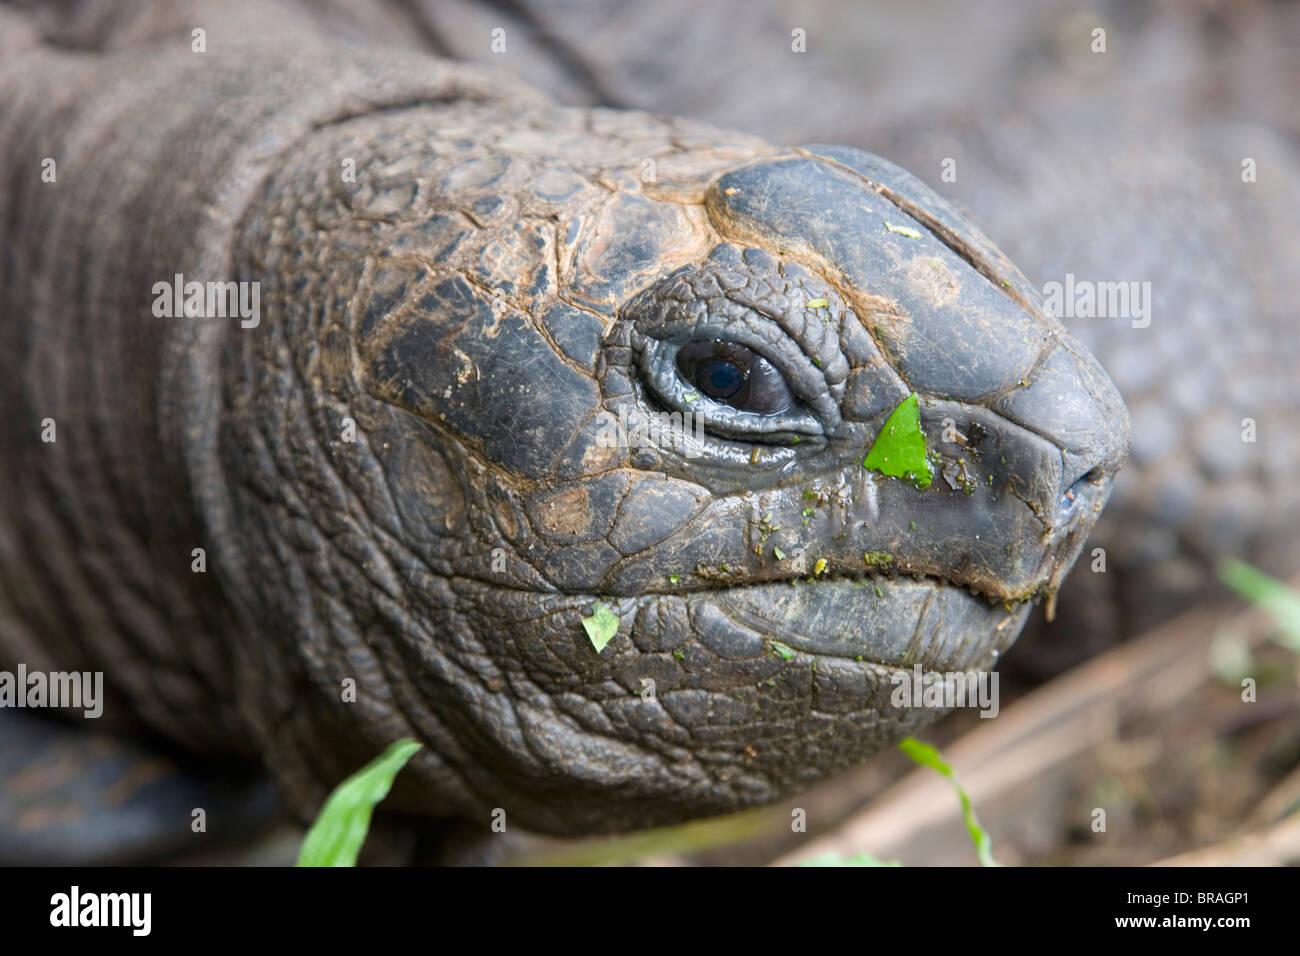 Head of Seychelles giant tortoise at the Jardin du Roi spice garden near Anse Royale, Island of Mahe, Seychelles Stock Photo